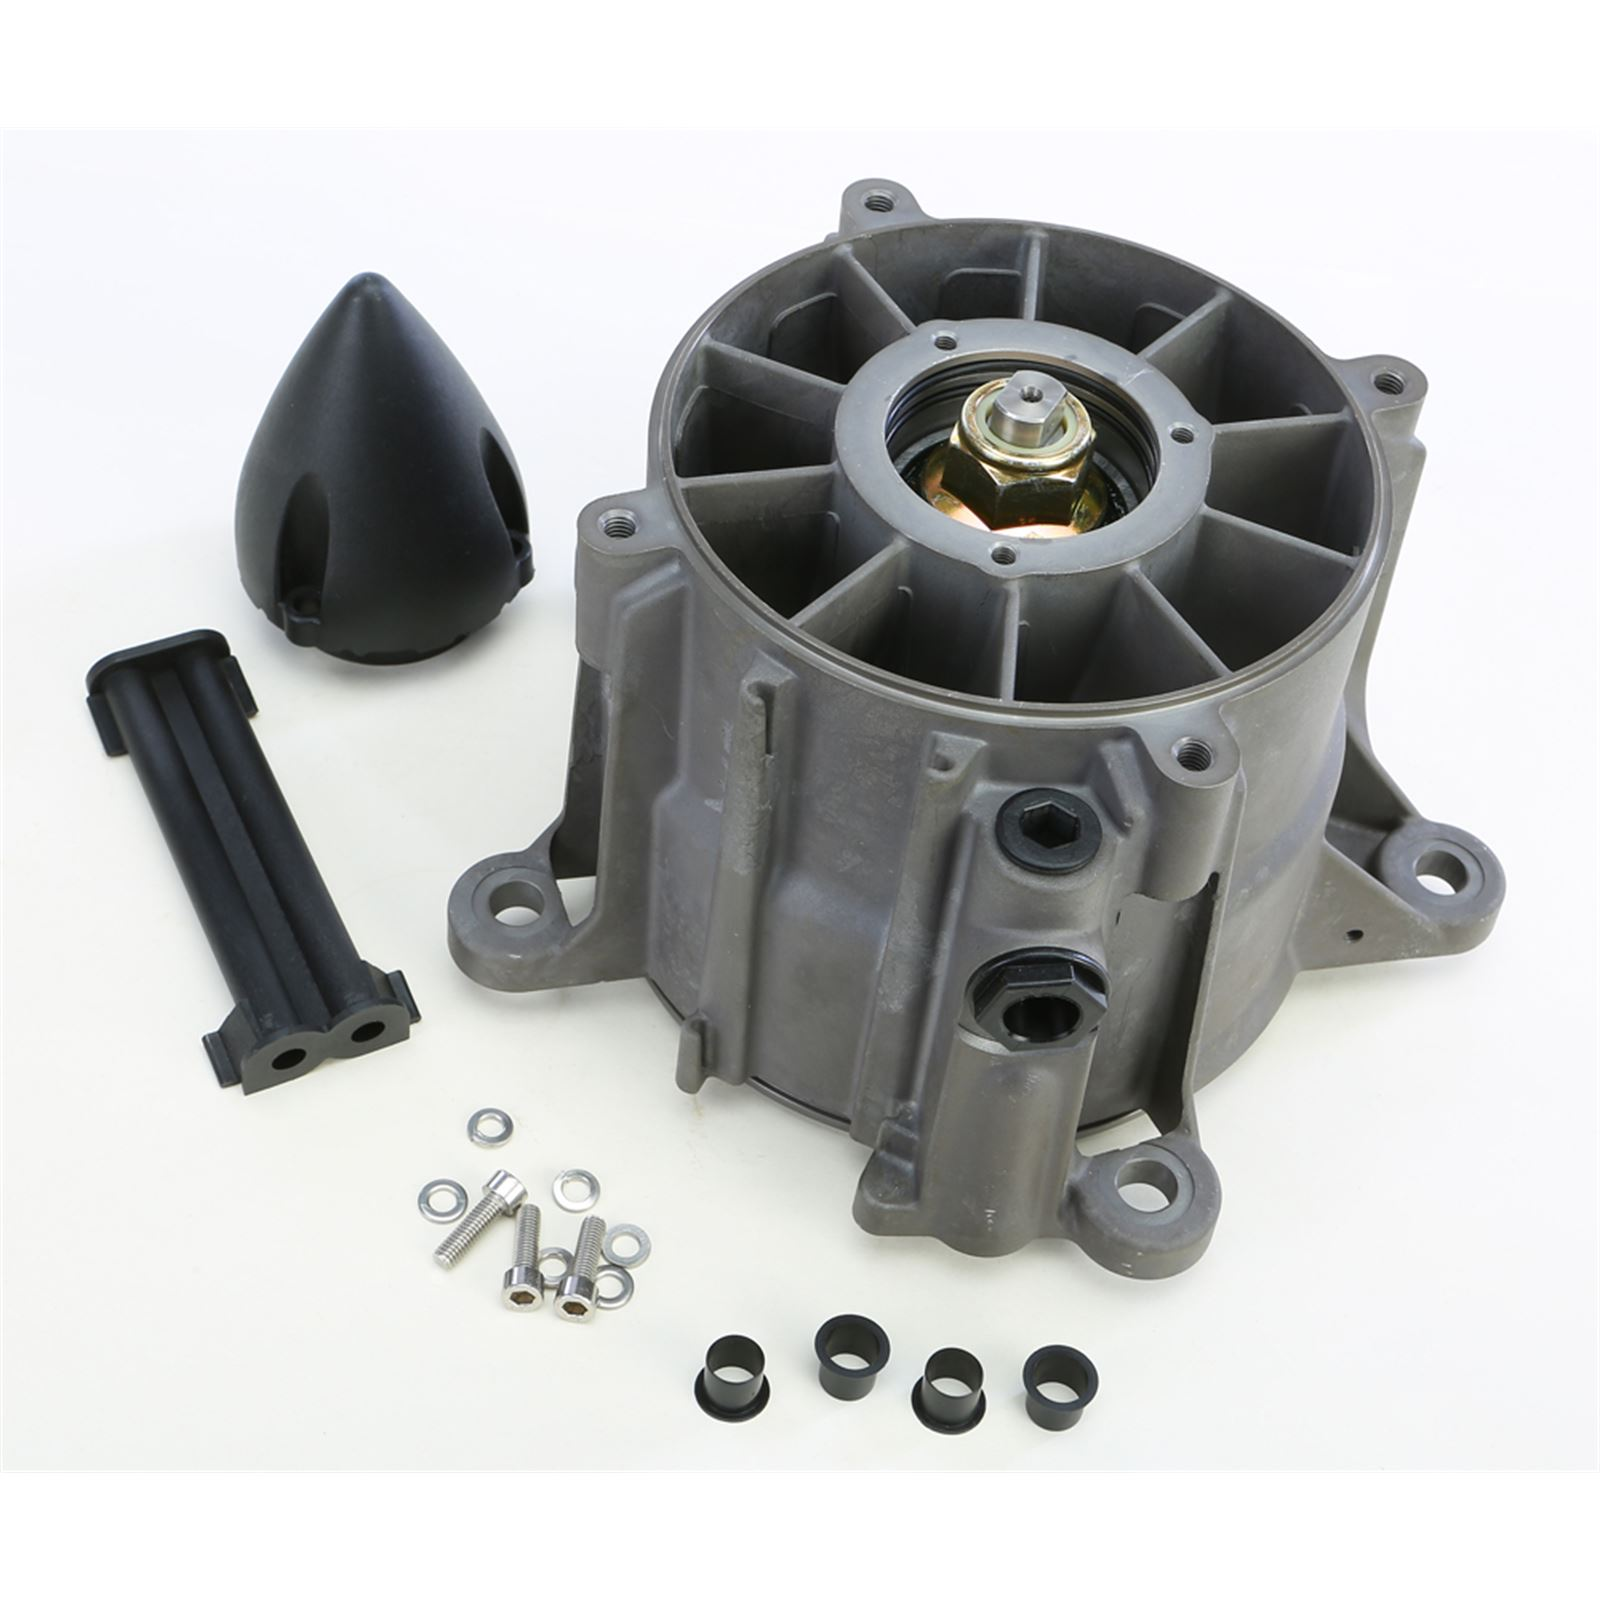 WSM Sea-Doo Jet Pump Assembly